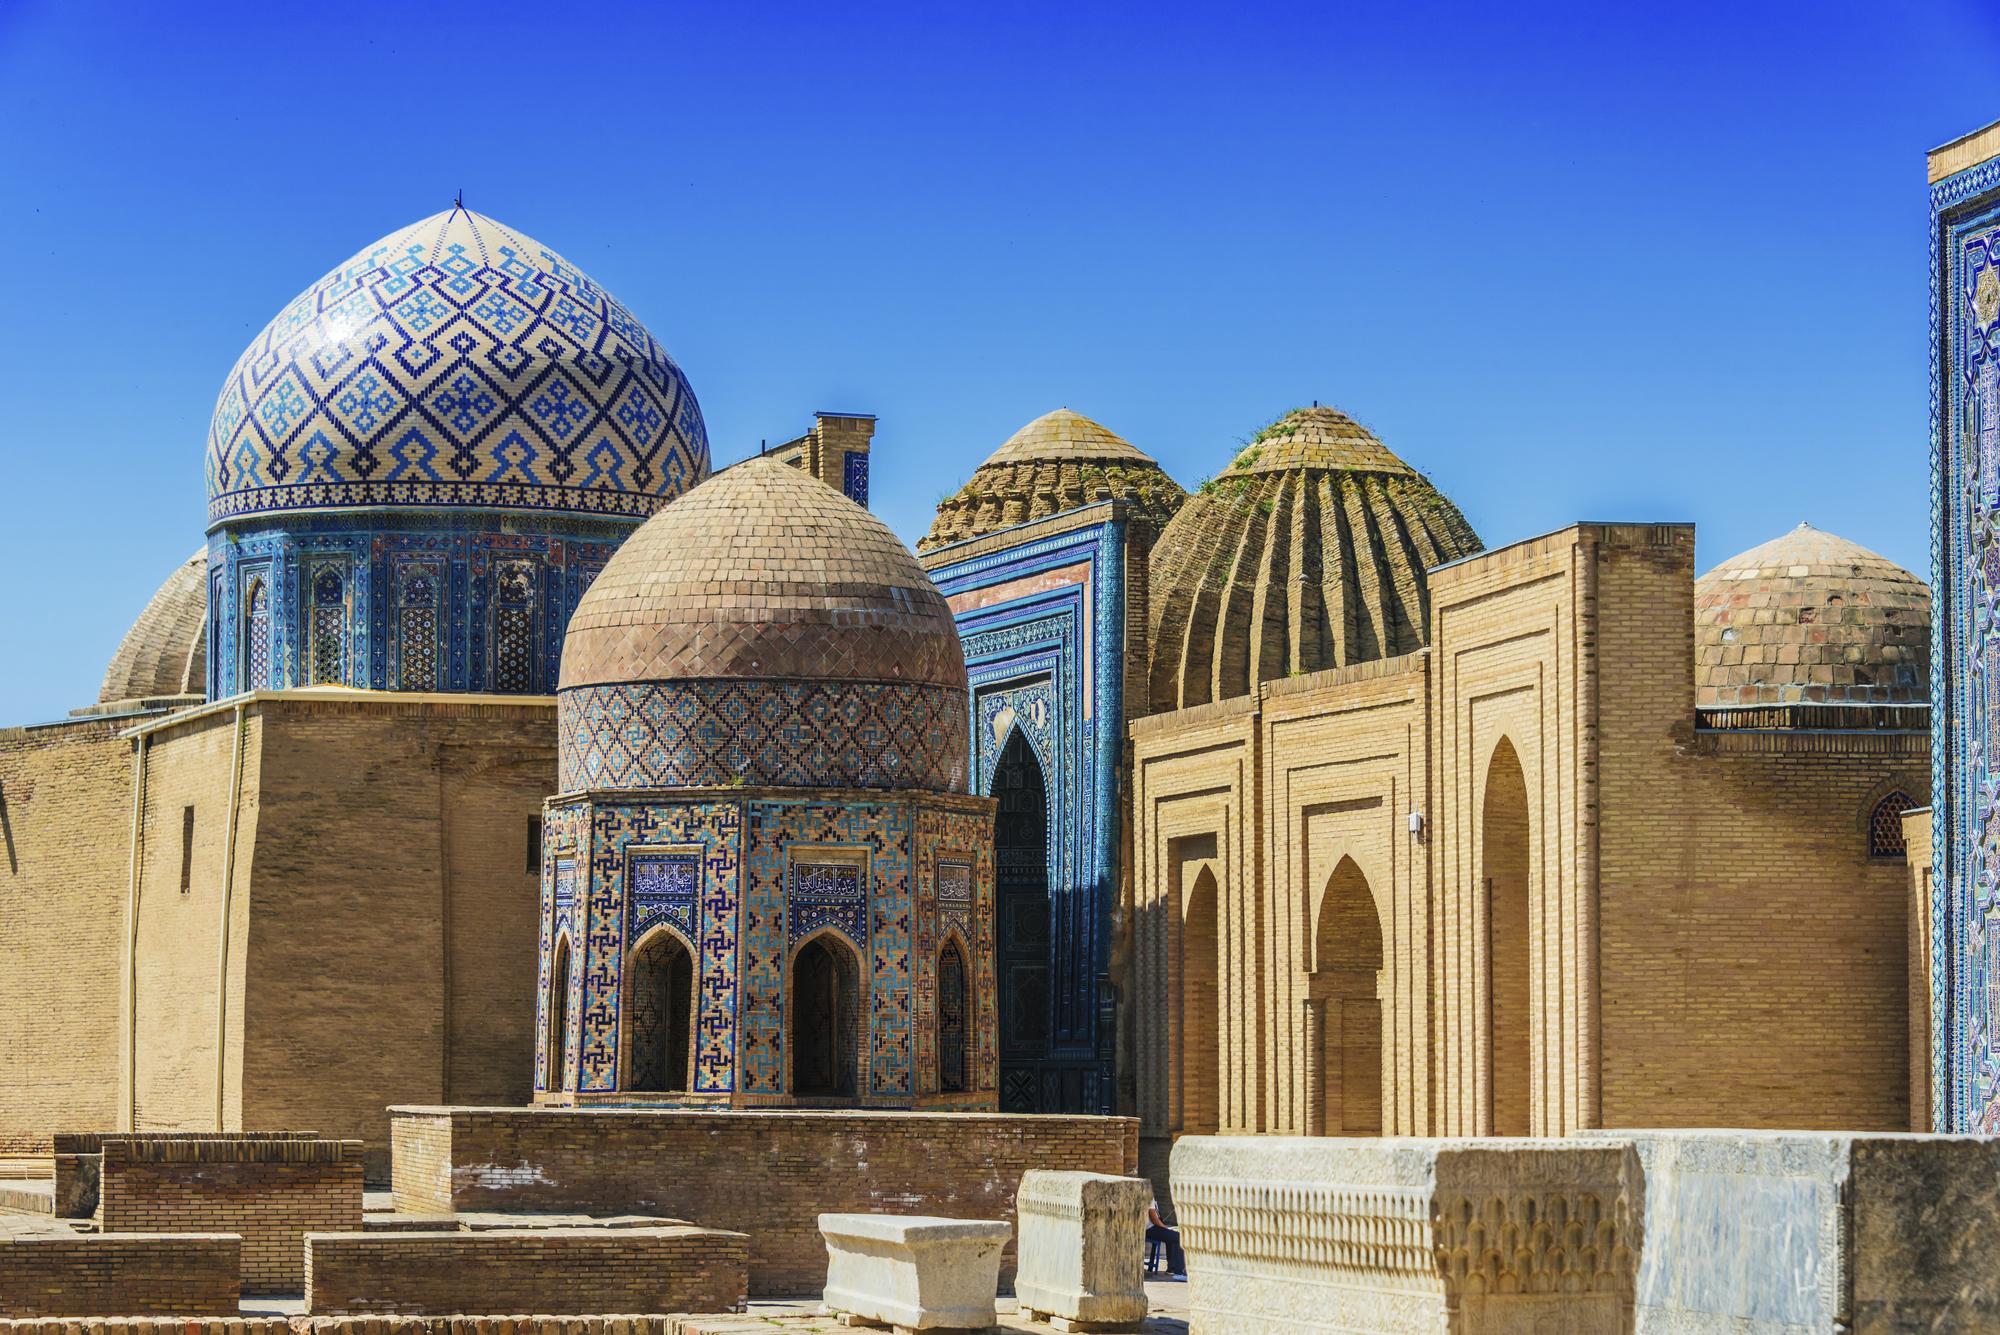 Usbekistan - das Herz Zentralasiens